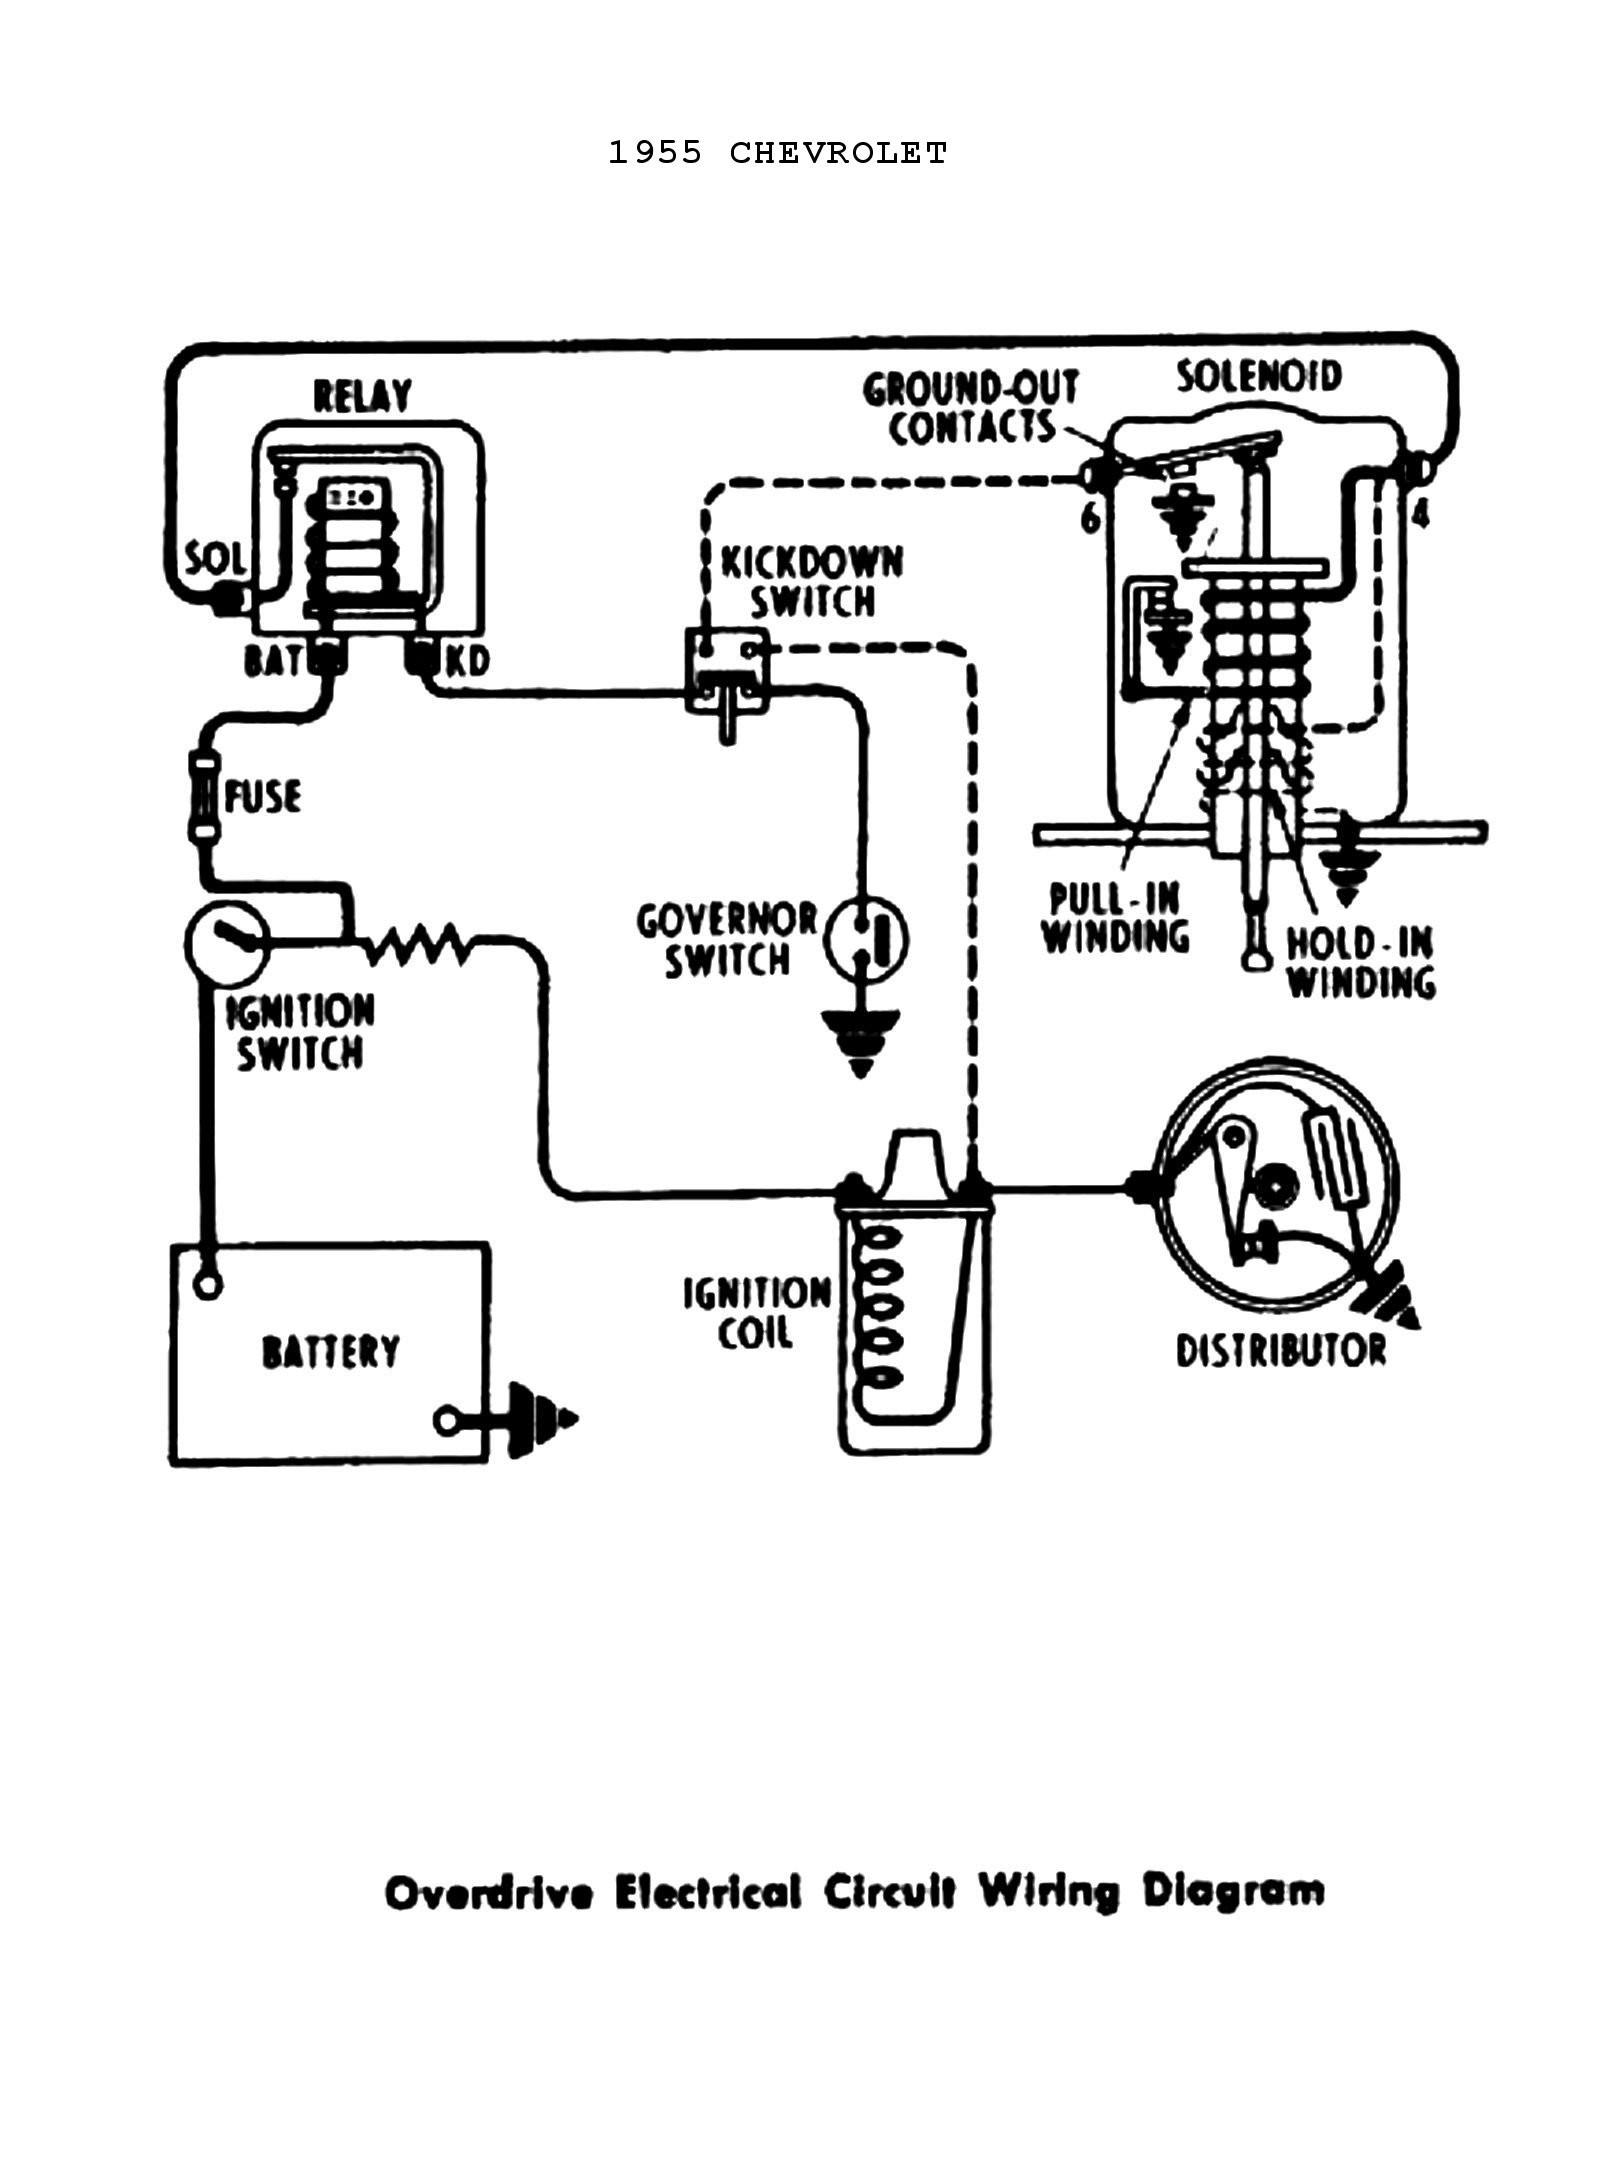 Car electrical system diagram chevy wiring diagrams my wiring diagram